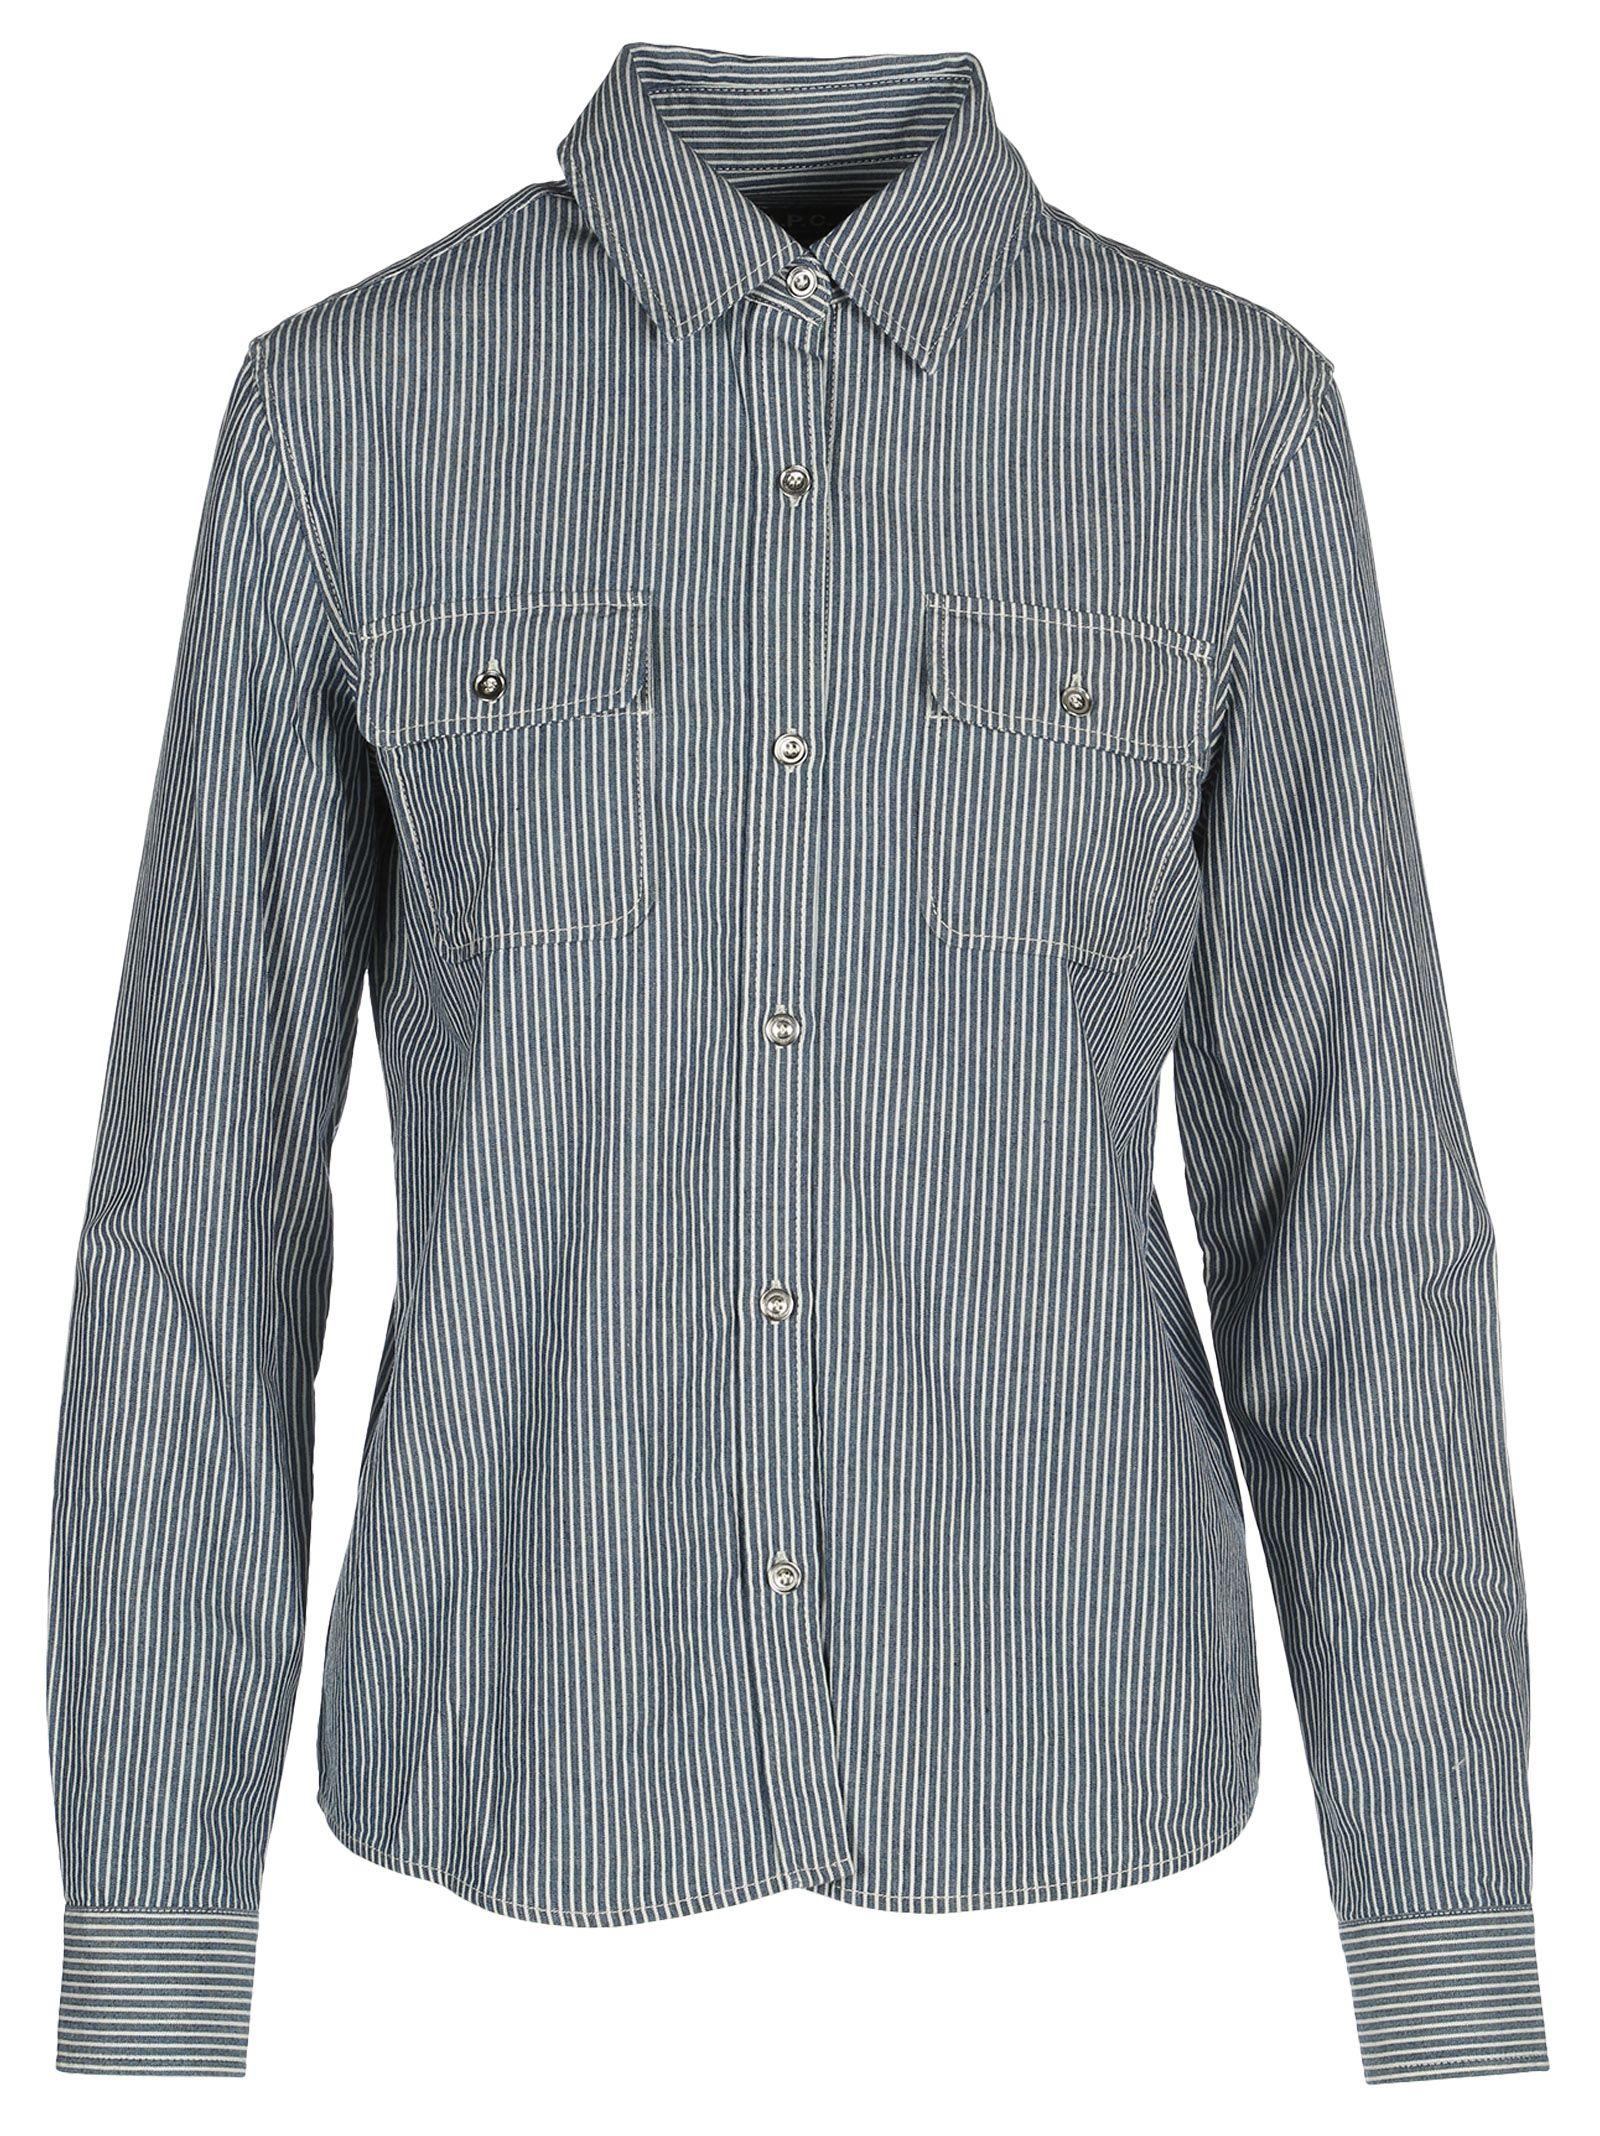 A.p.c Girl Striped Shirt